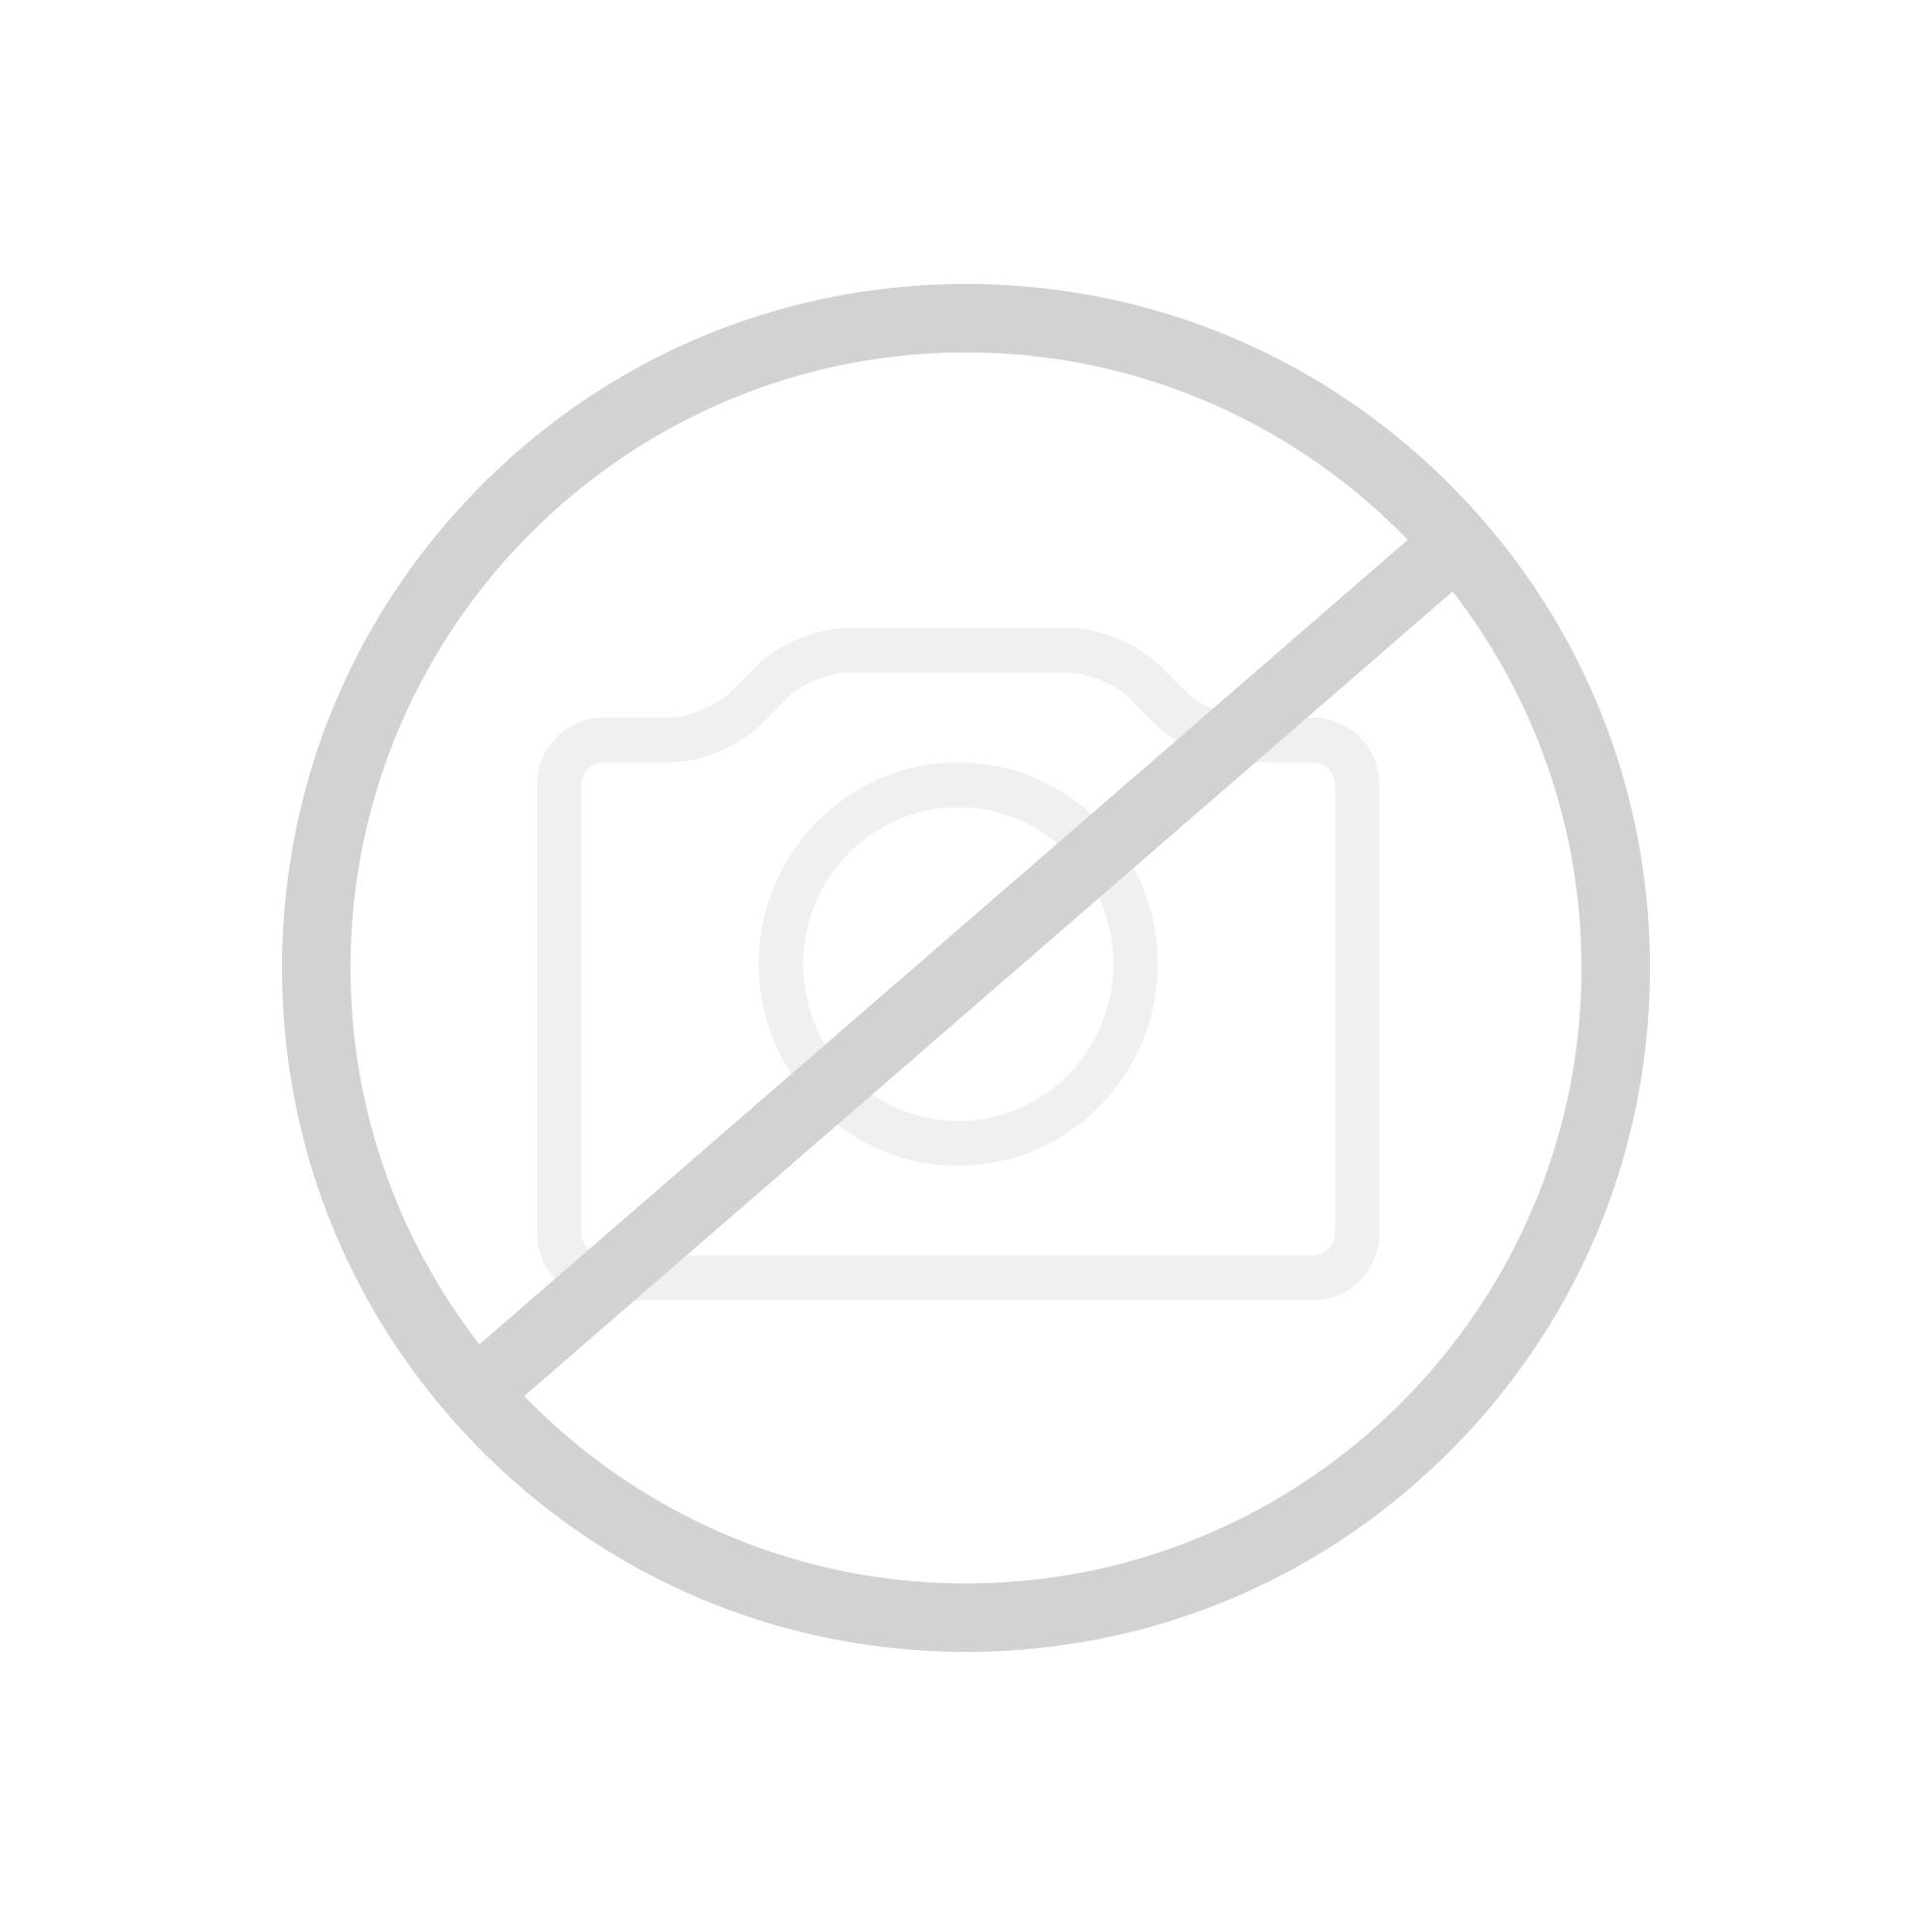 antoniolupi PLAY54 Handtuchstange B: 540 mm